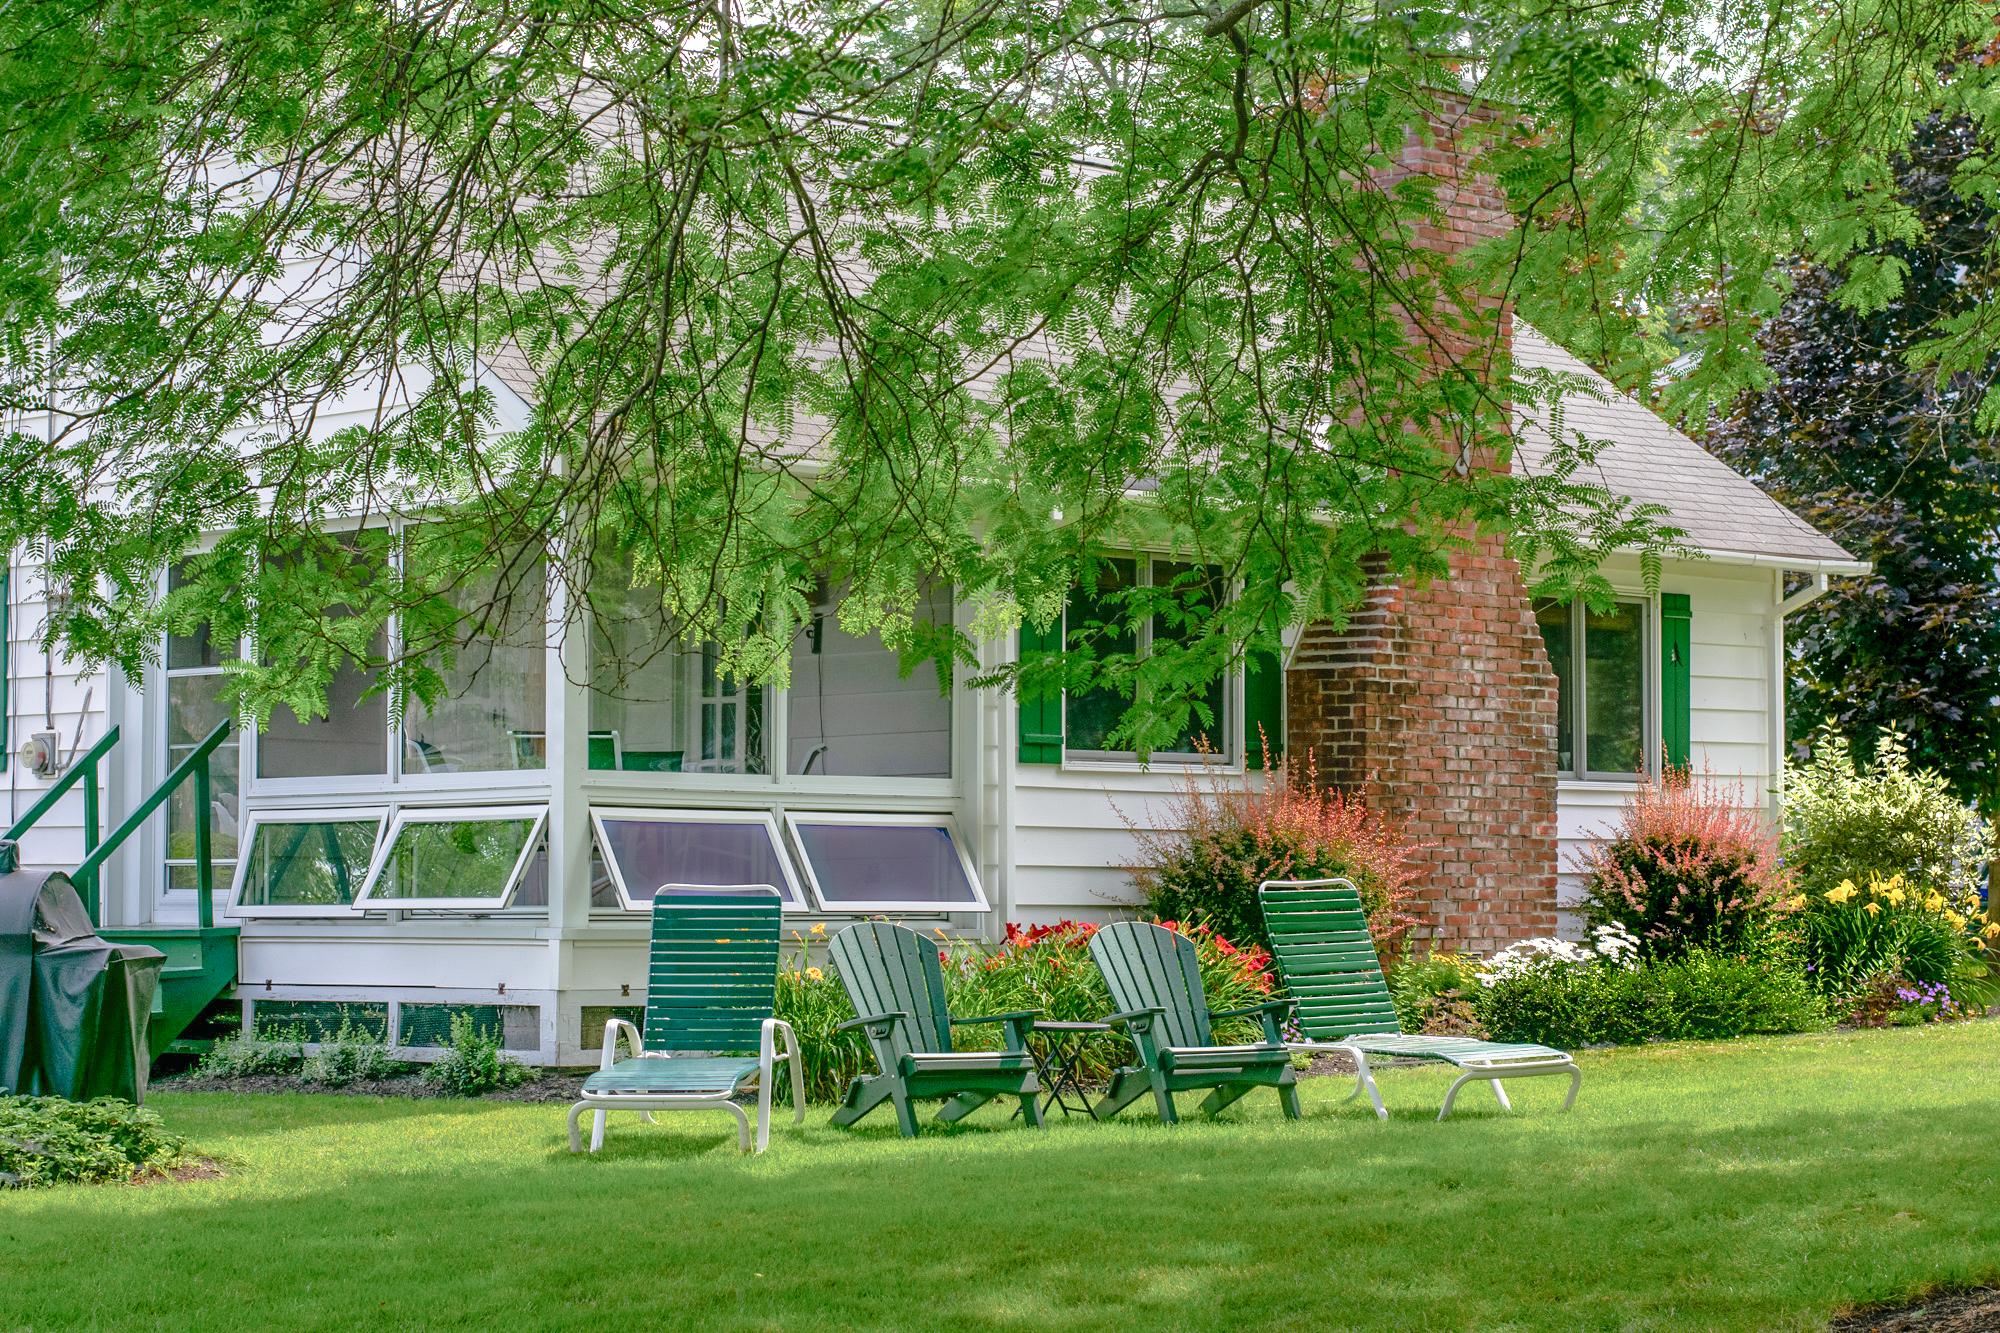 Takundewide Cottage #11 exteriorDSC_0006